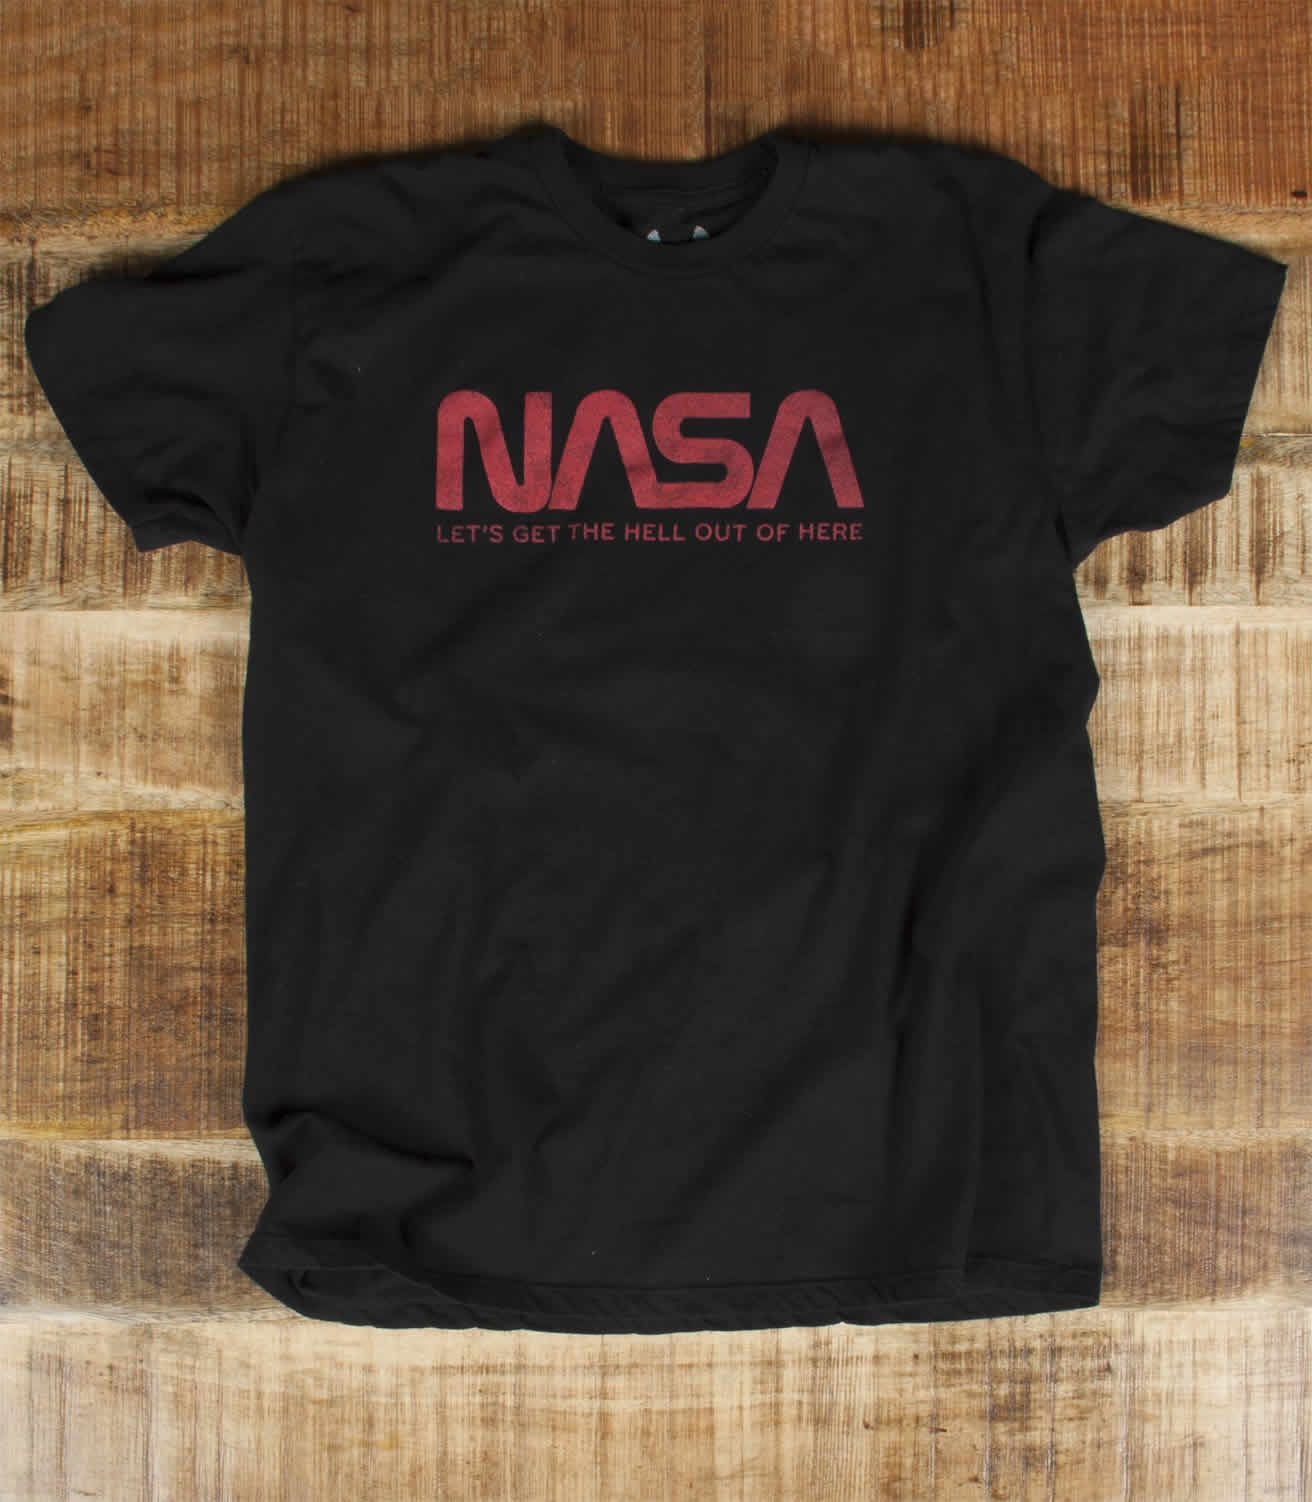 NASA Men's T-Shirt | Headline Shirts